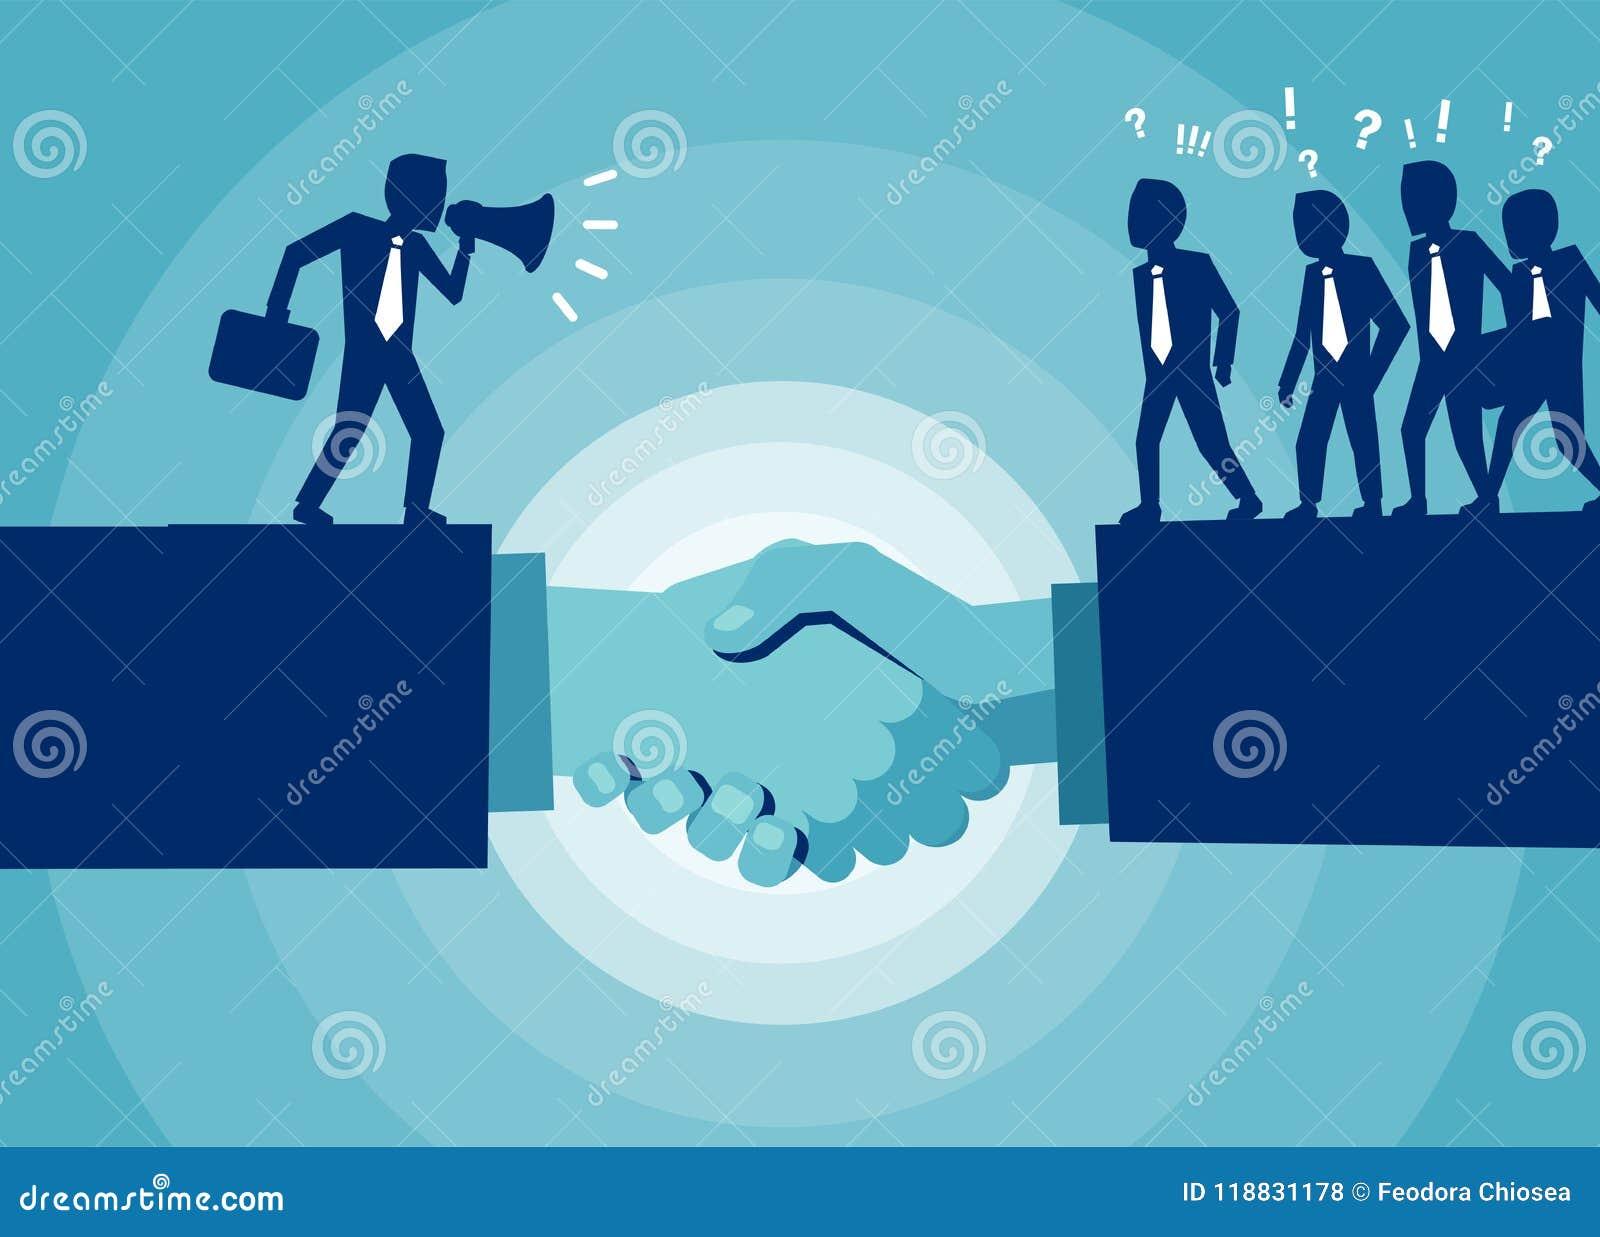 Flat Design Of People In Teamwork Stock Illustration Illustration